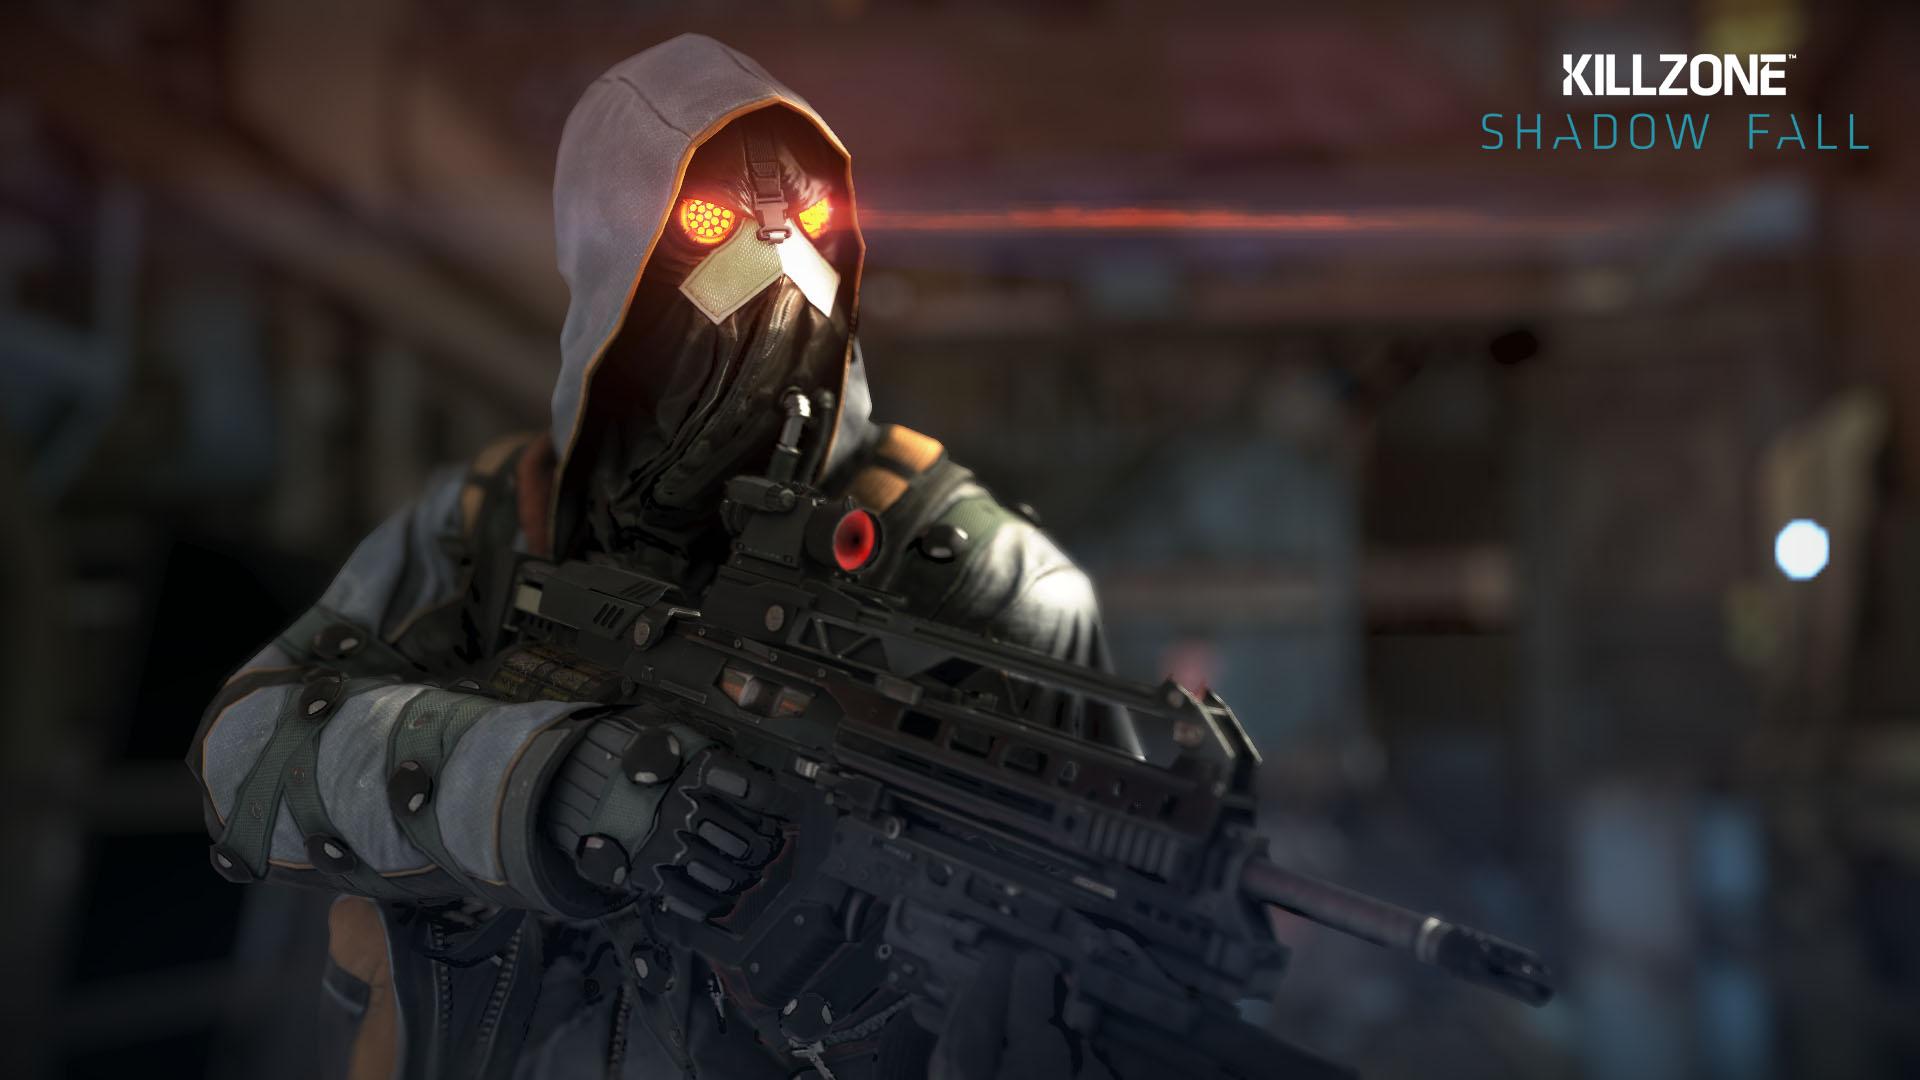 [Oficial] Killzone:Shadow Fall 9837157165_df691e1fc4_o